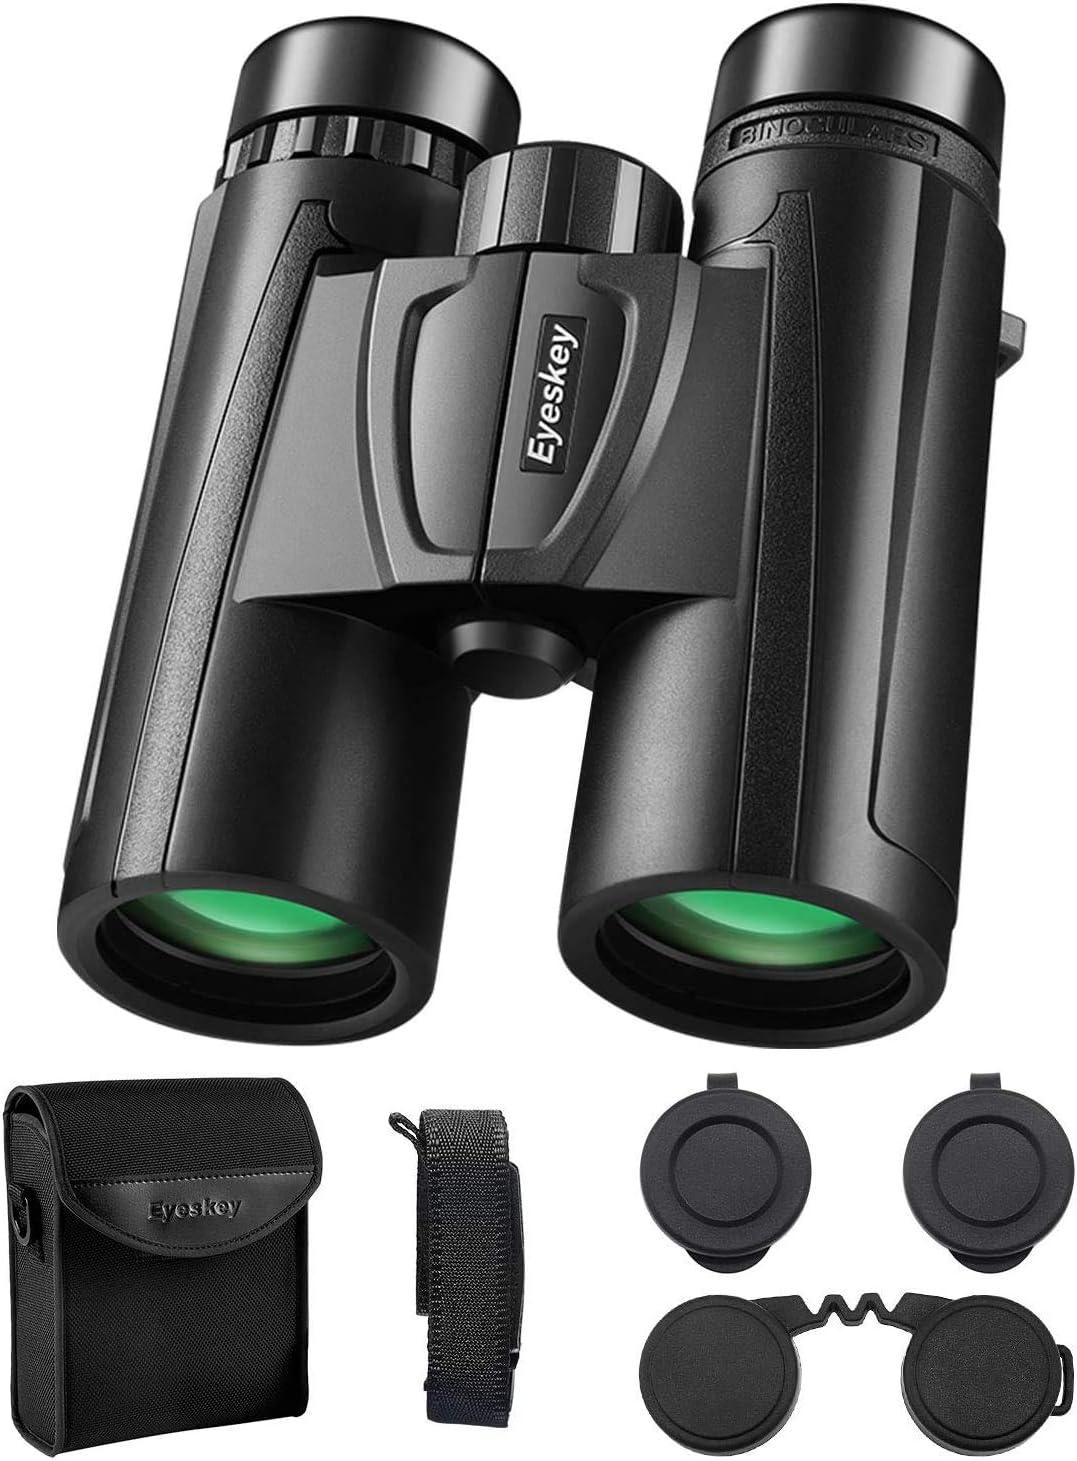 Binoculars for 予約 Adults HD 贈り物 Binocular Con Watching Bird Travel